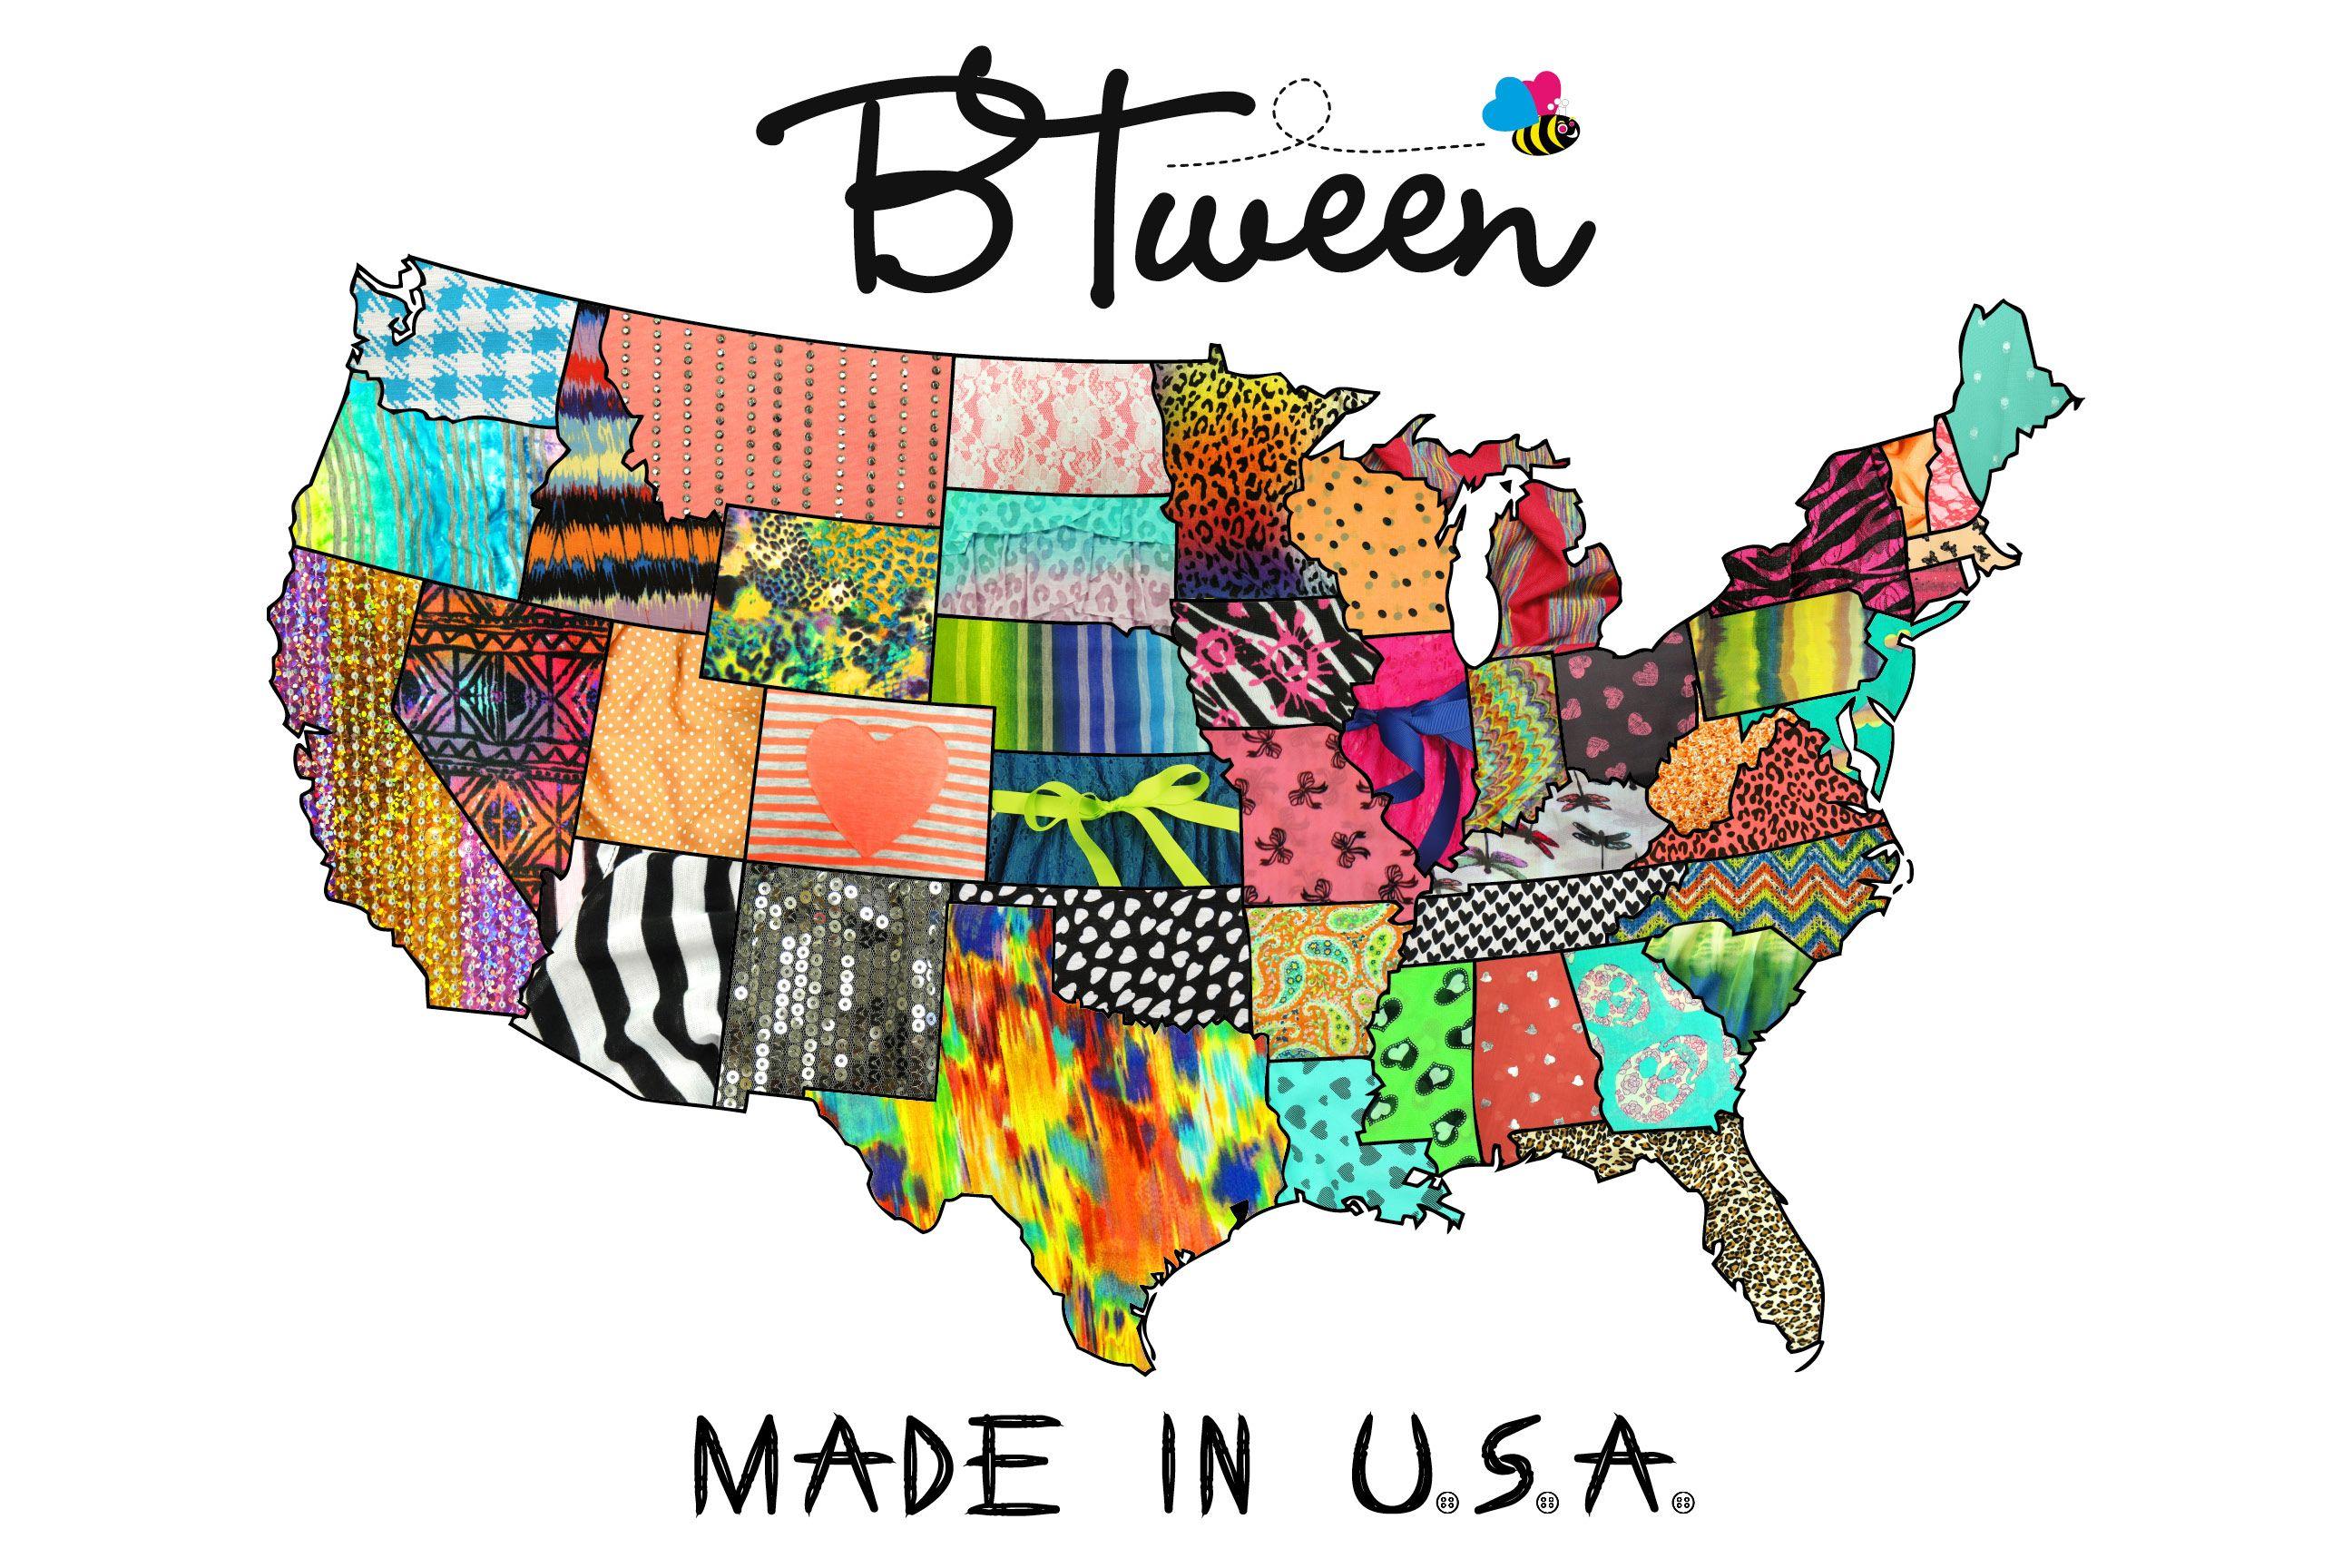 BTween Made in U.S.A. Moose art, How to make, Art